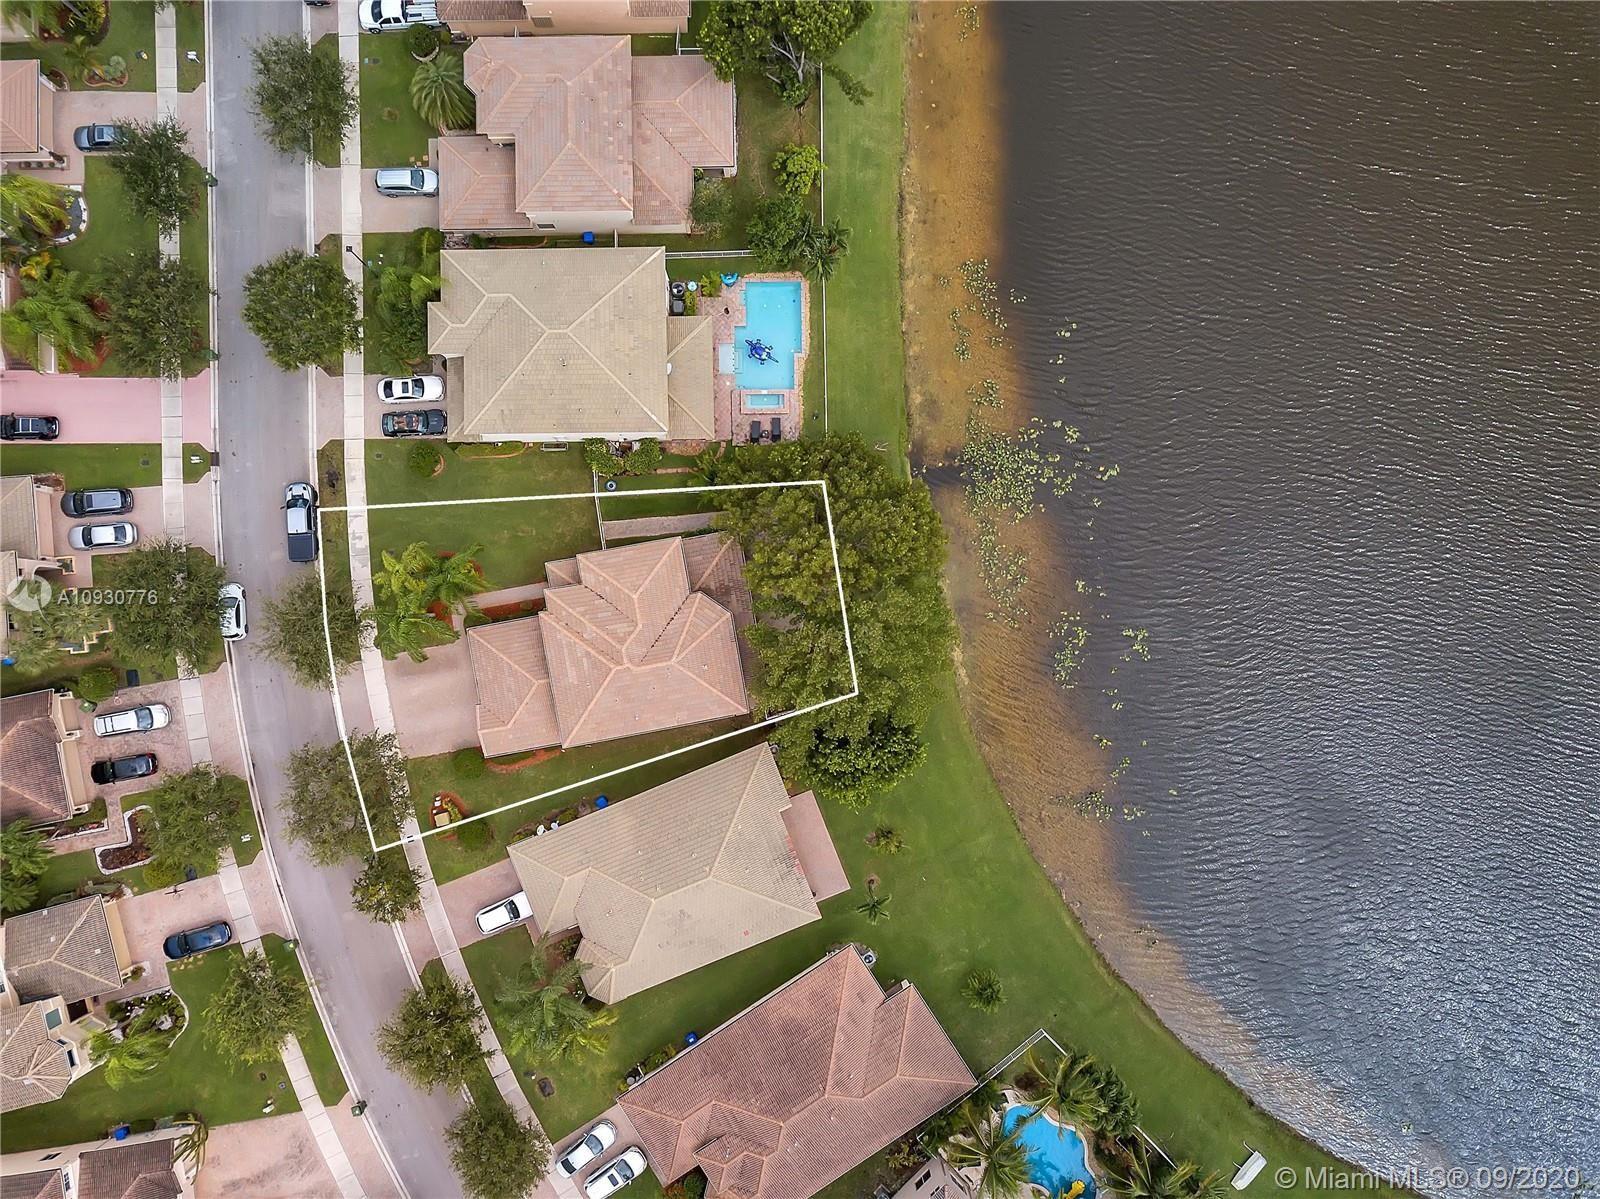 Photo of 19434 SW 60th Ct, Pembroke Pines, FL 33332 (MLS # A10930776)